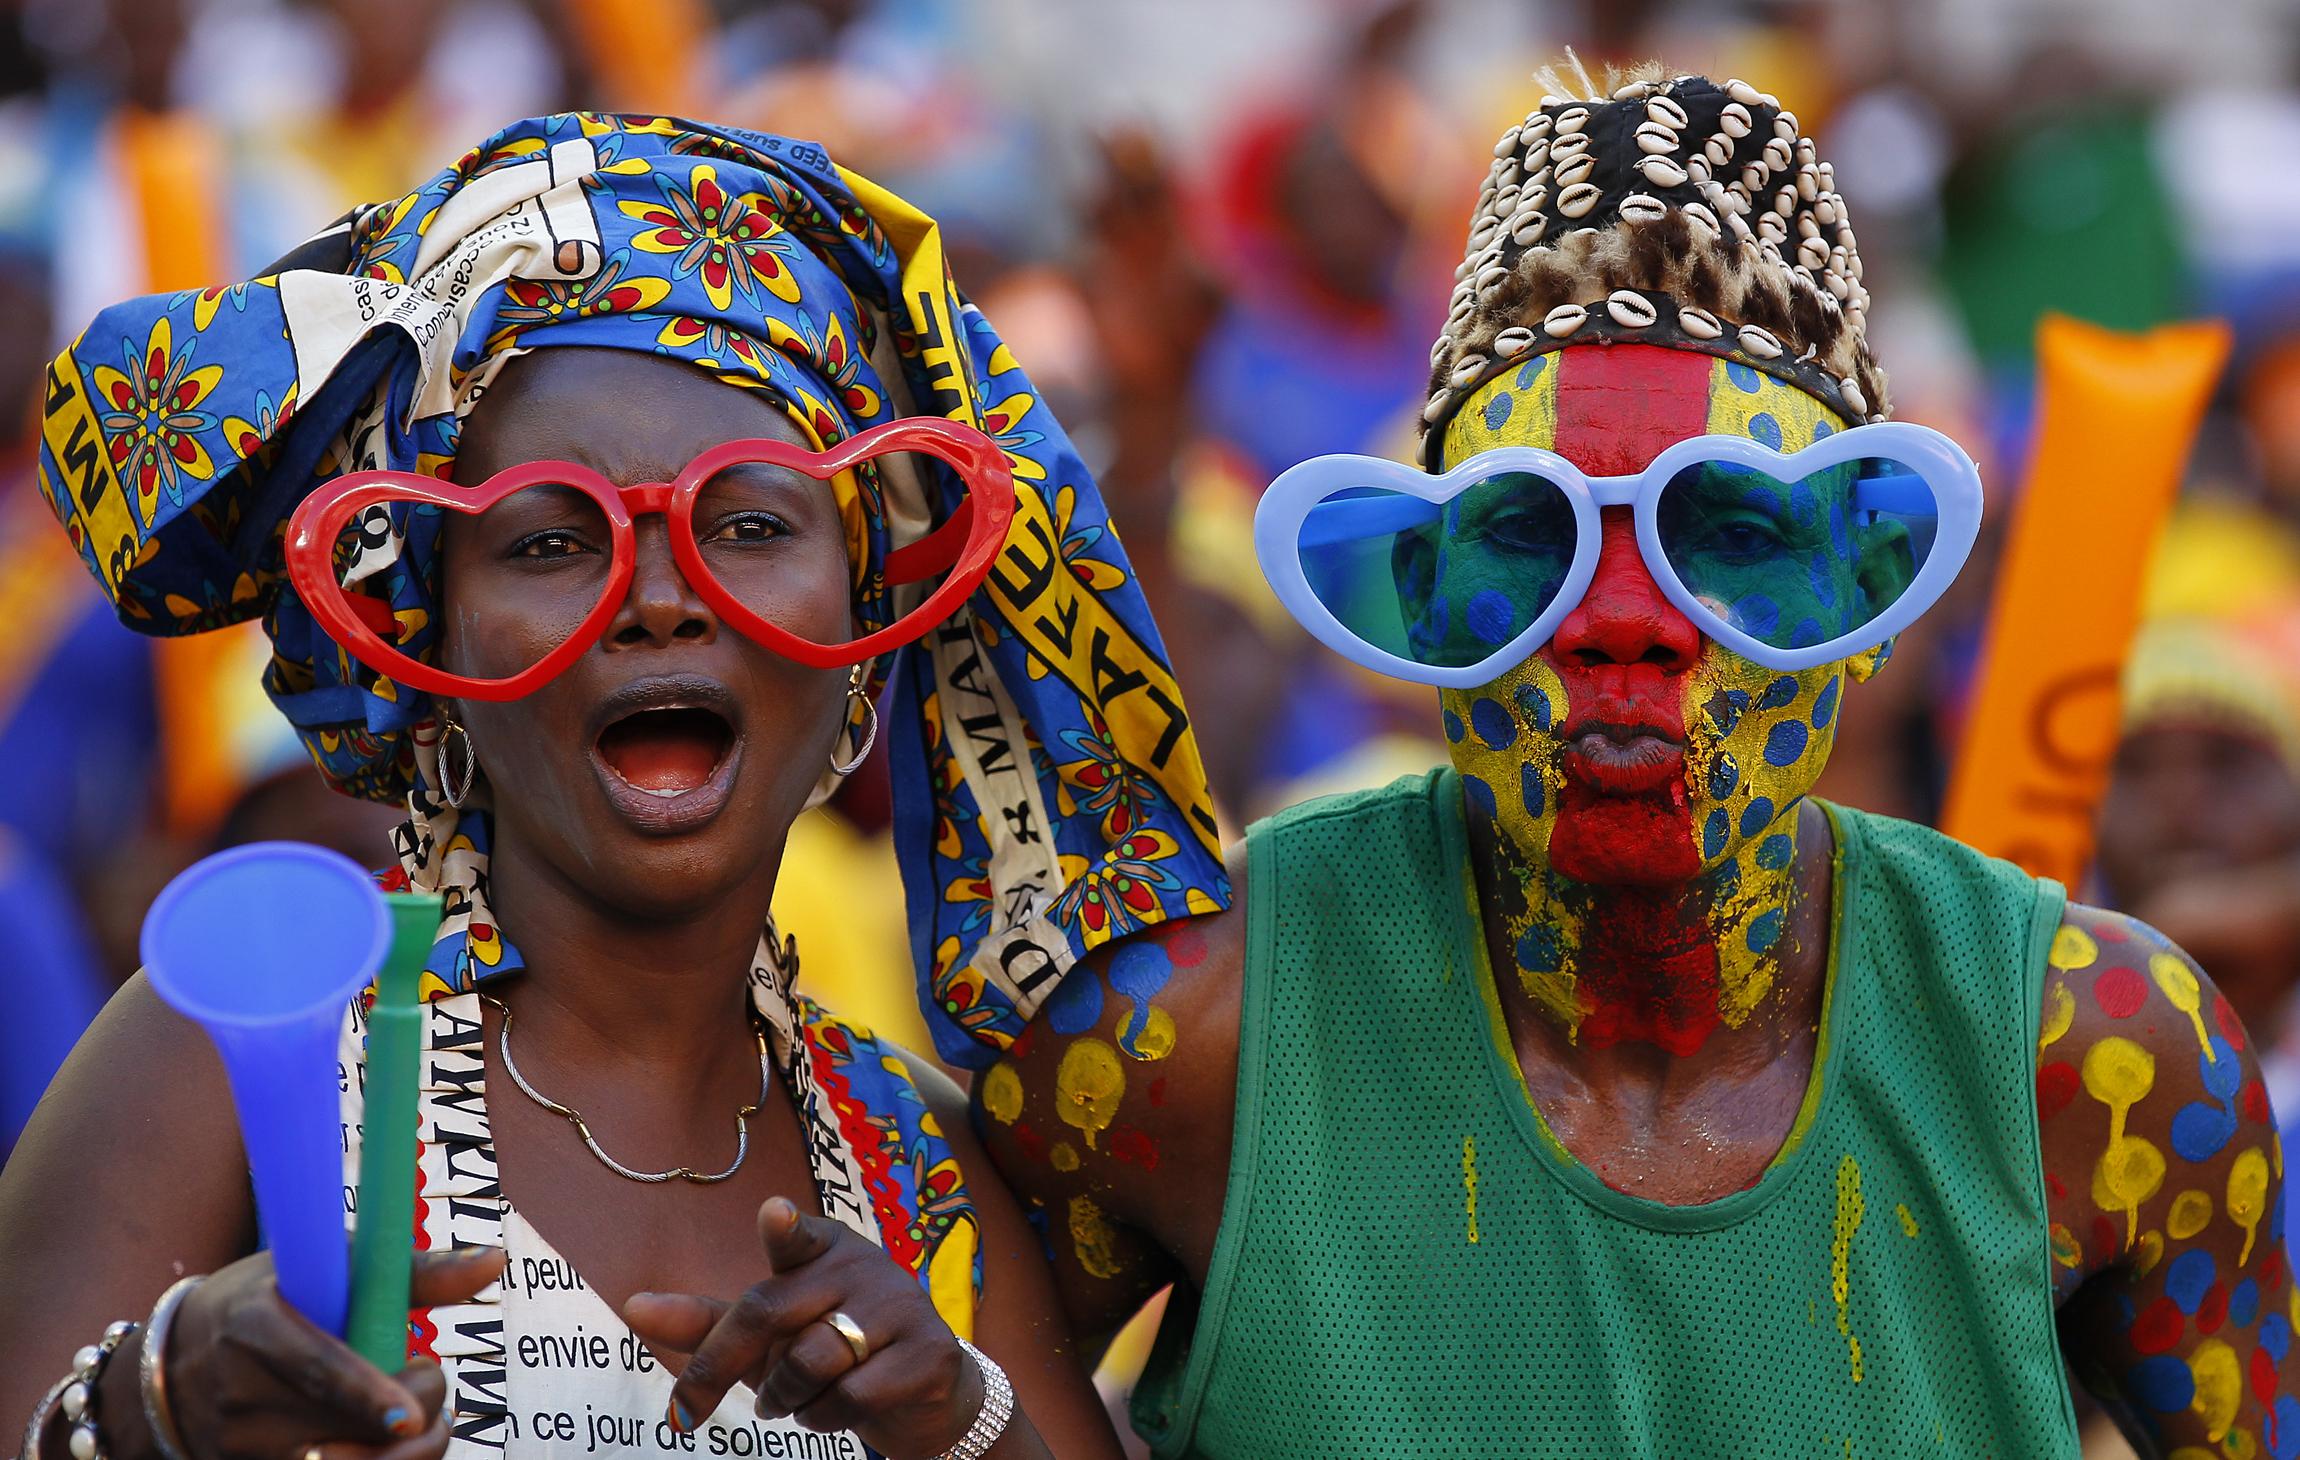 https://i0.wp.com/blogs.voanews.com/sonny/files/2013/02/DRC-fans_AFCON2013.jpg